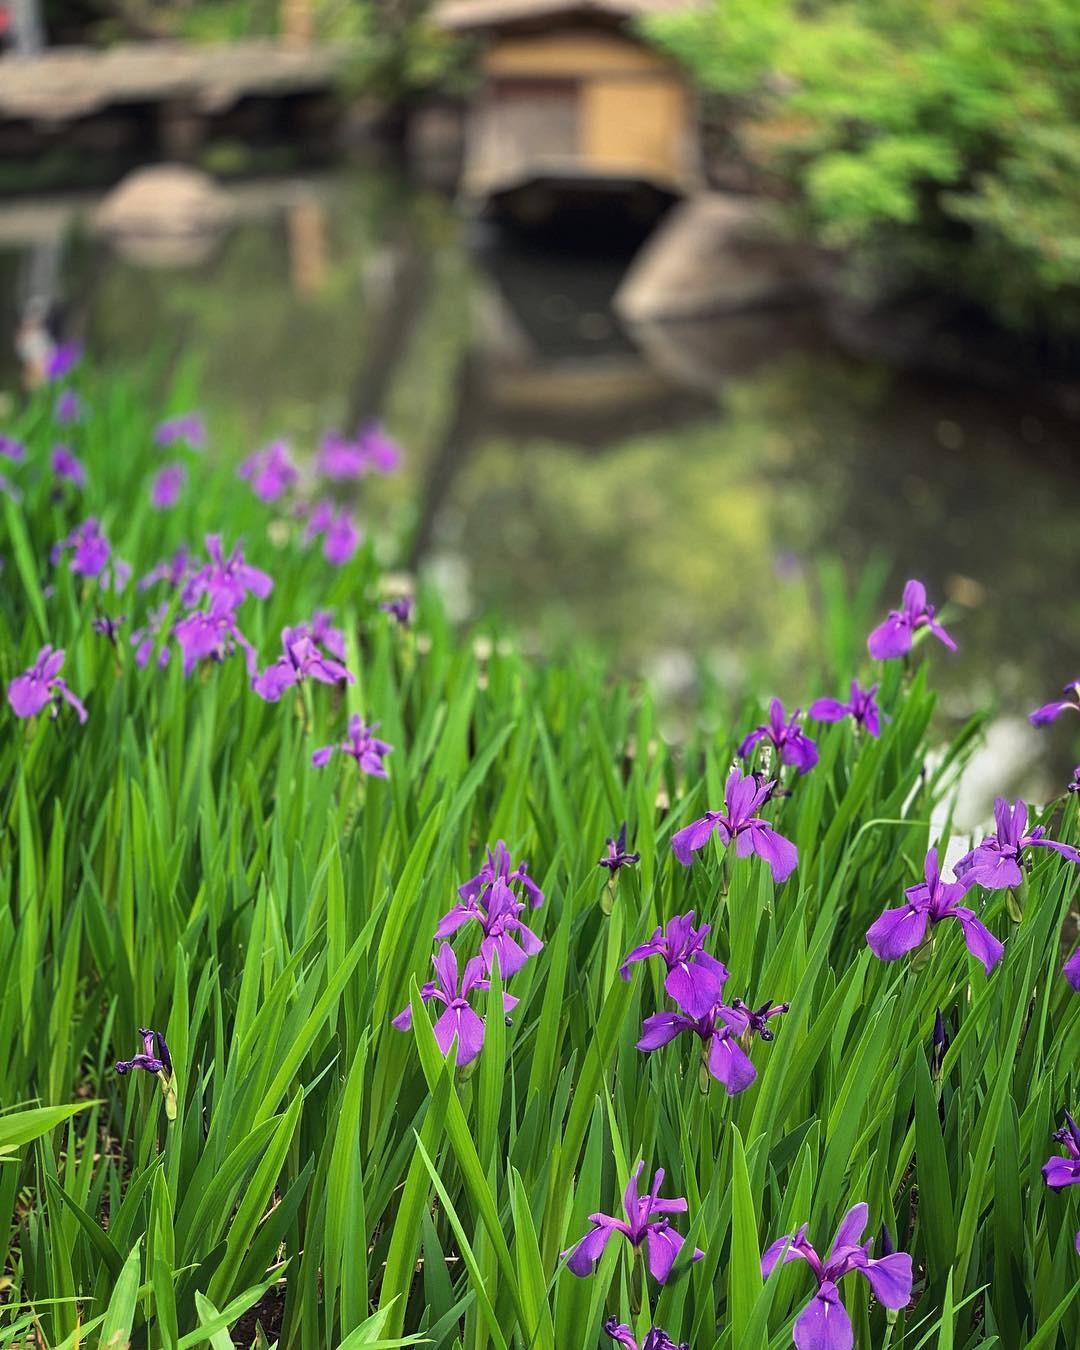 燕子花満開 根津美術館庭園にて_e0243332_17410029.jpg